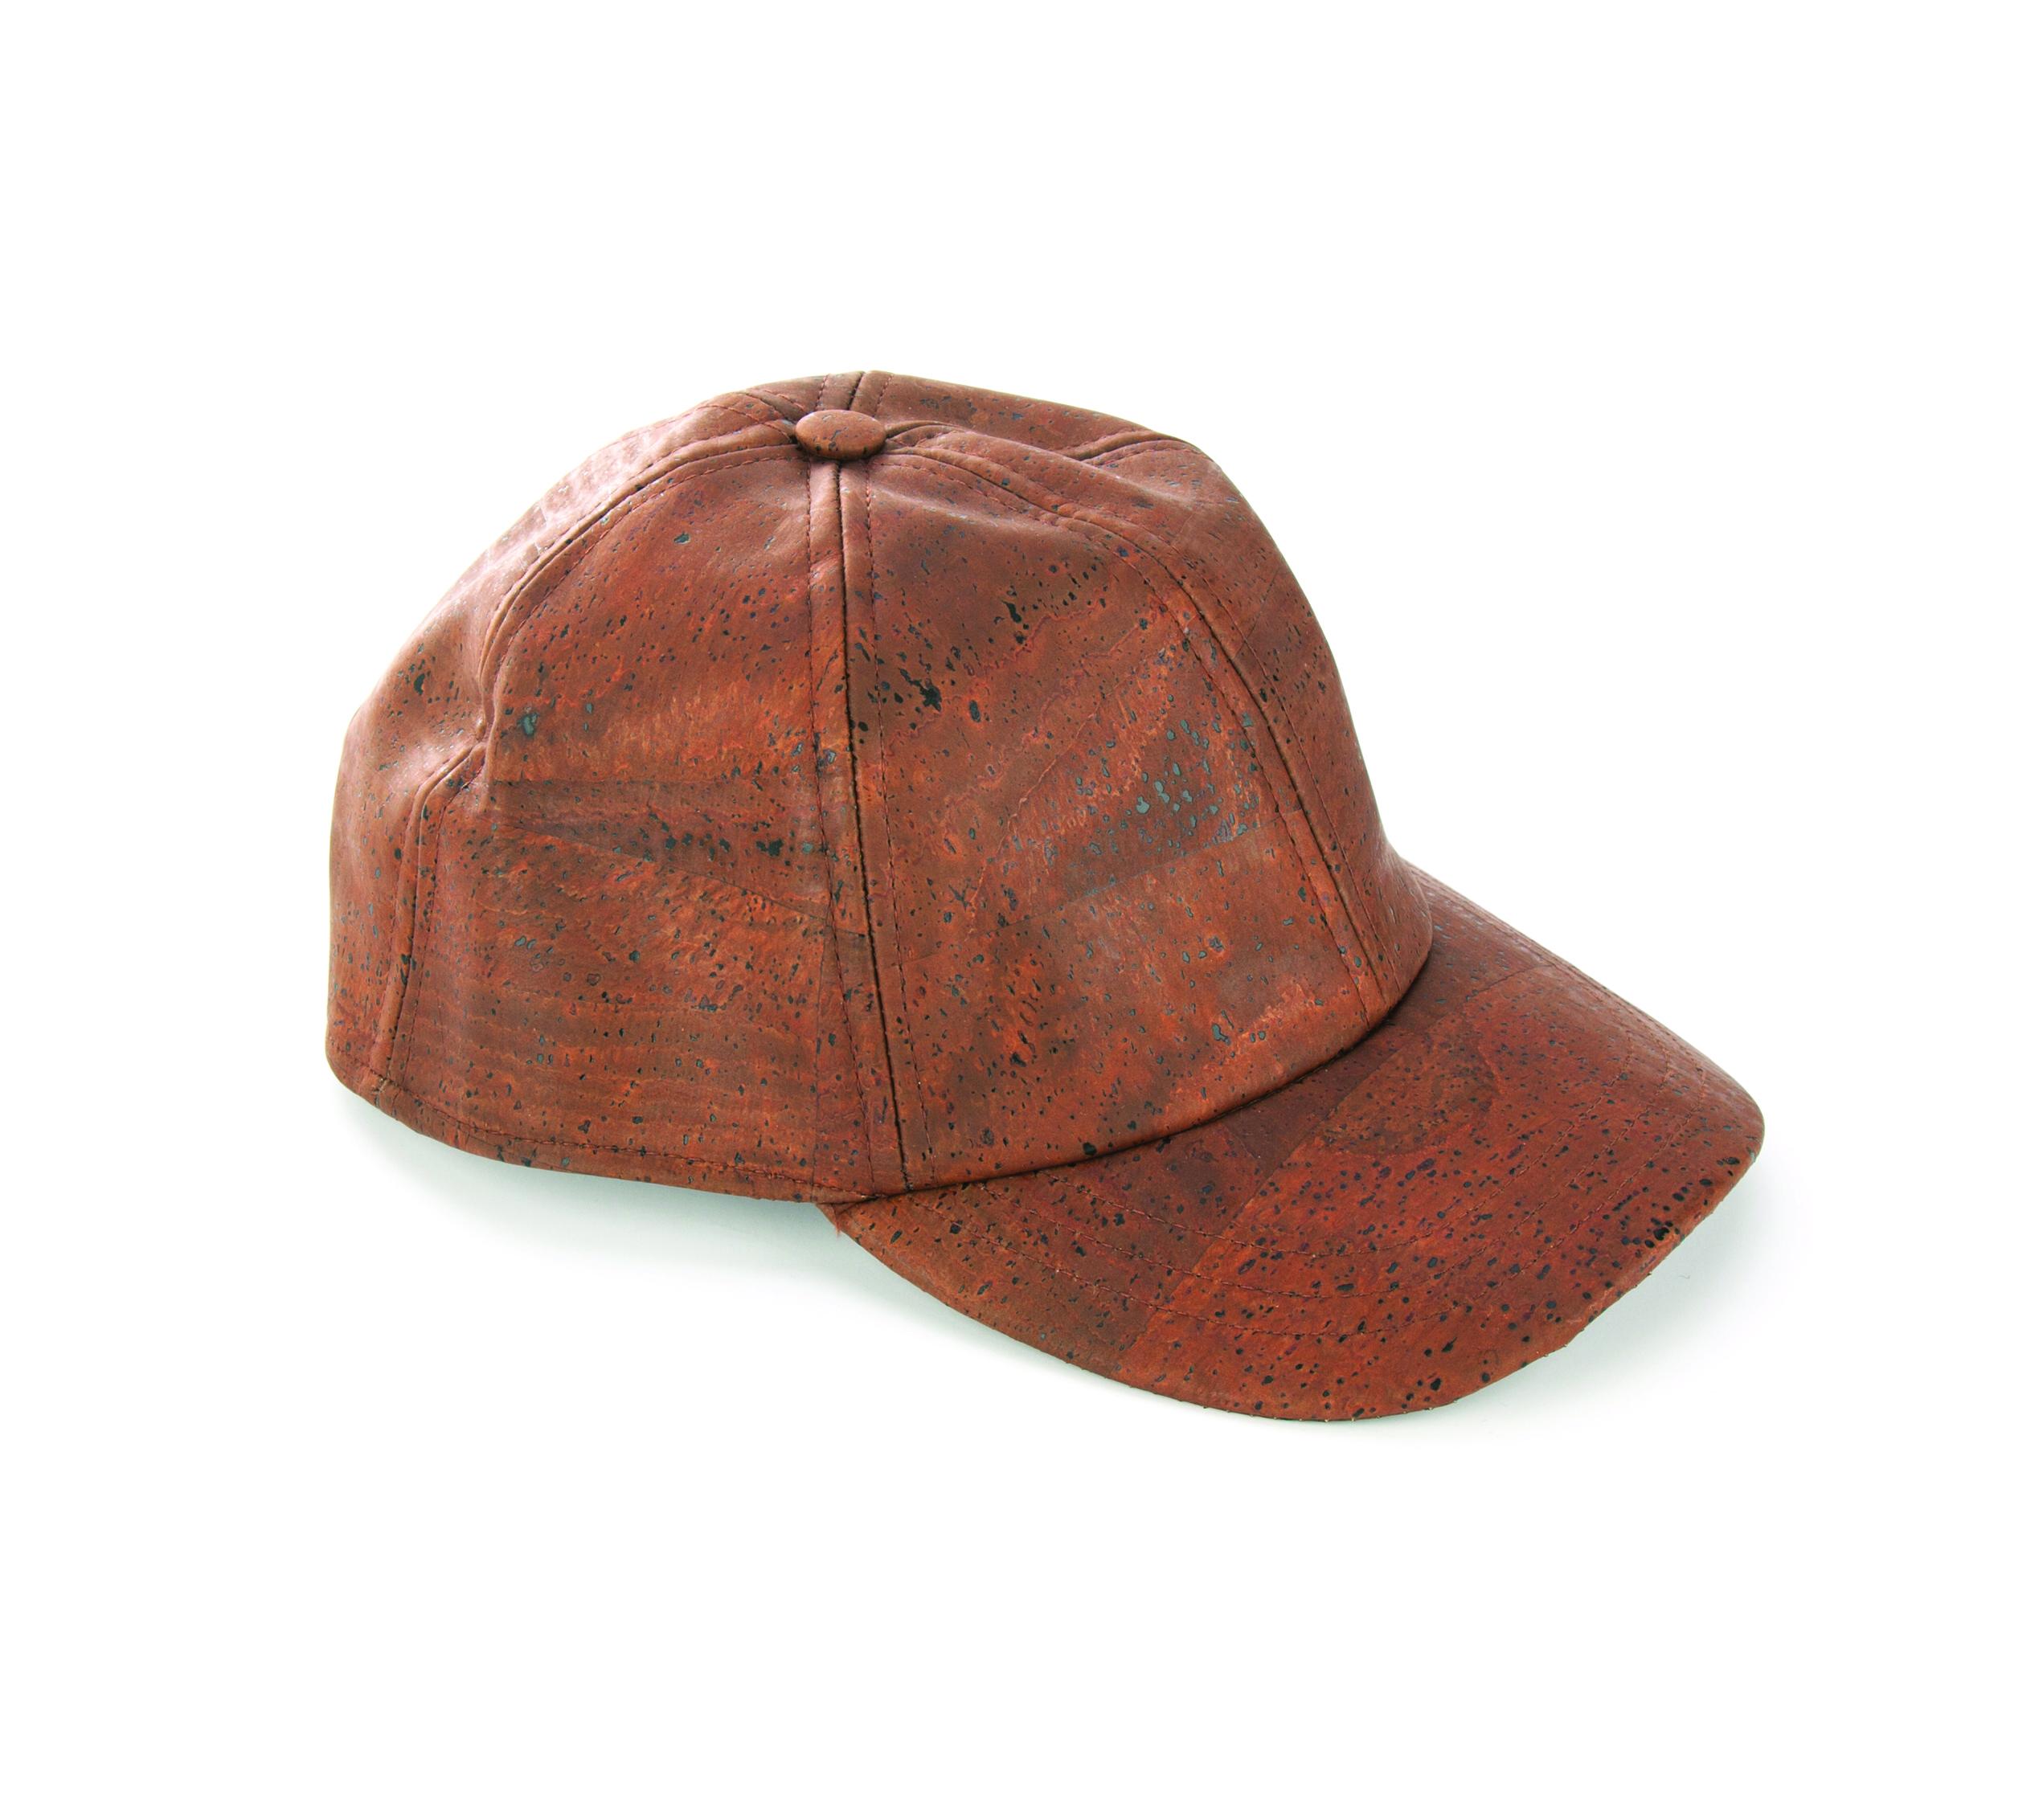 Basecap aus Kork